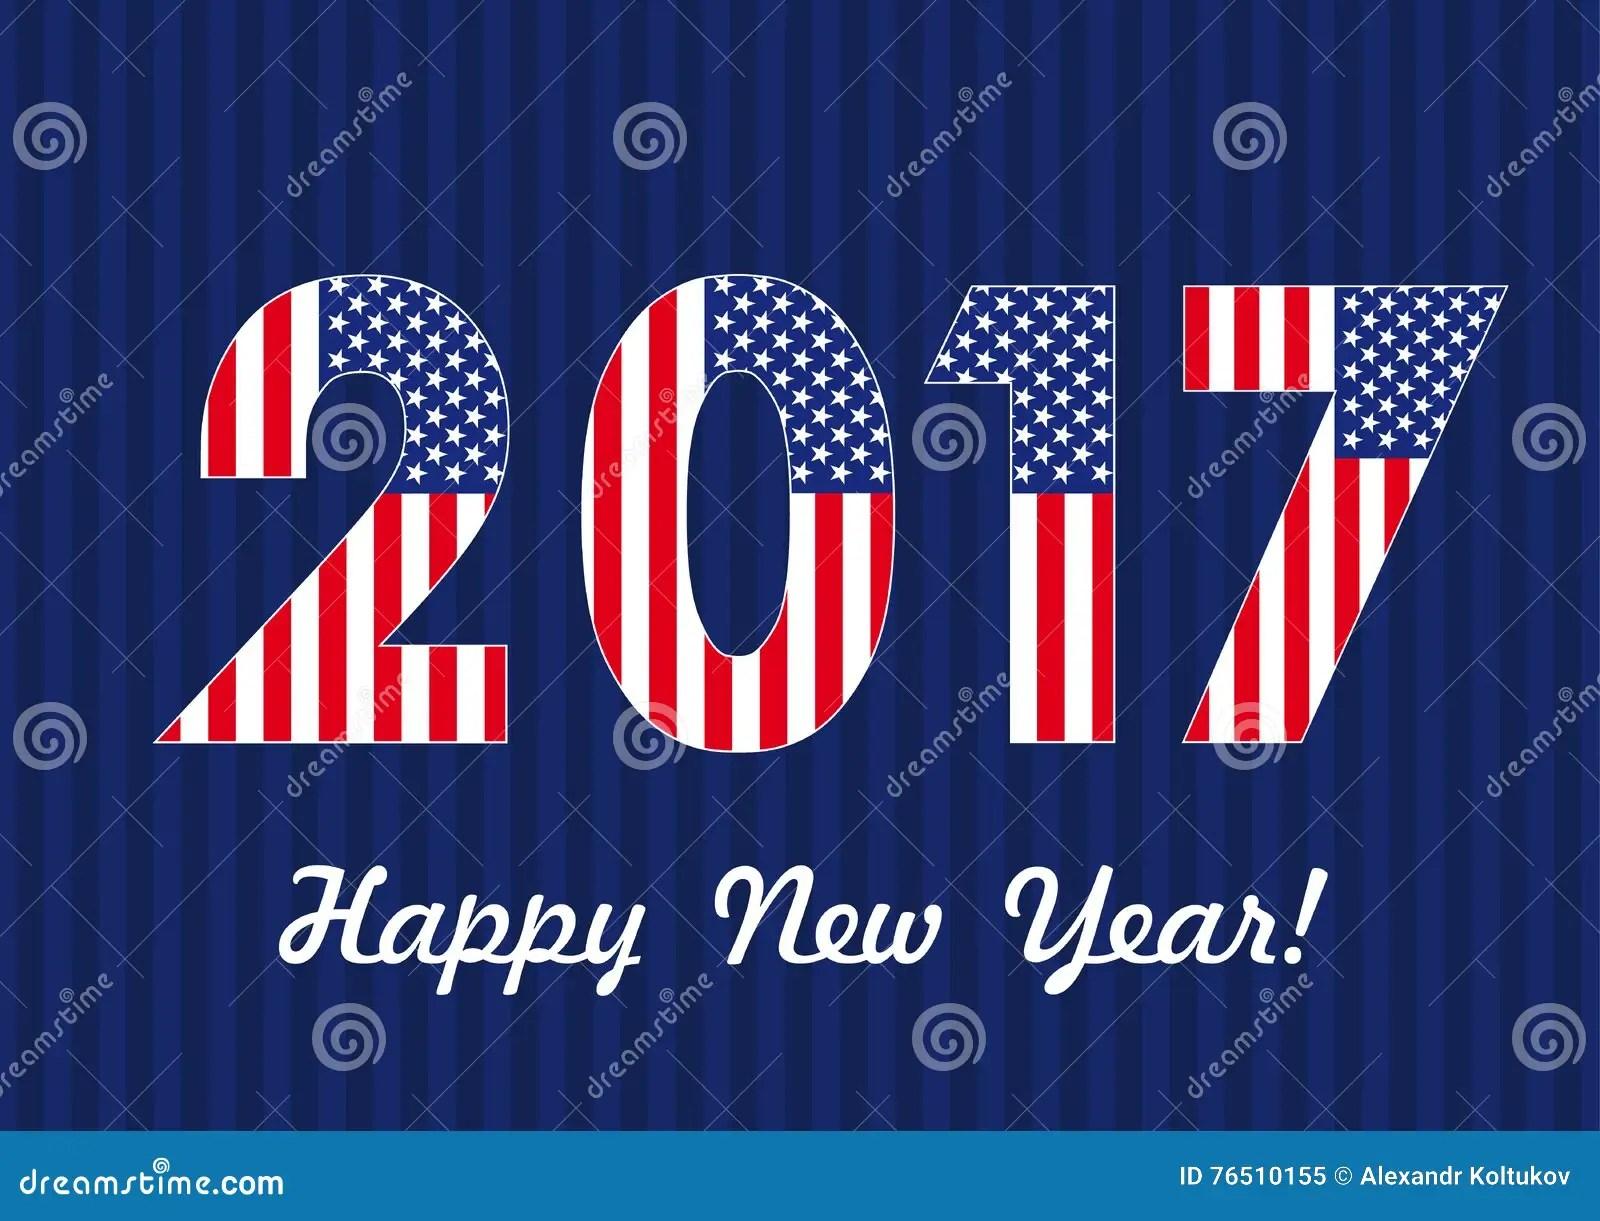 usa happy new year